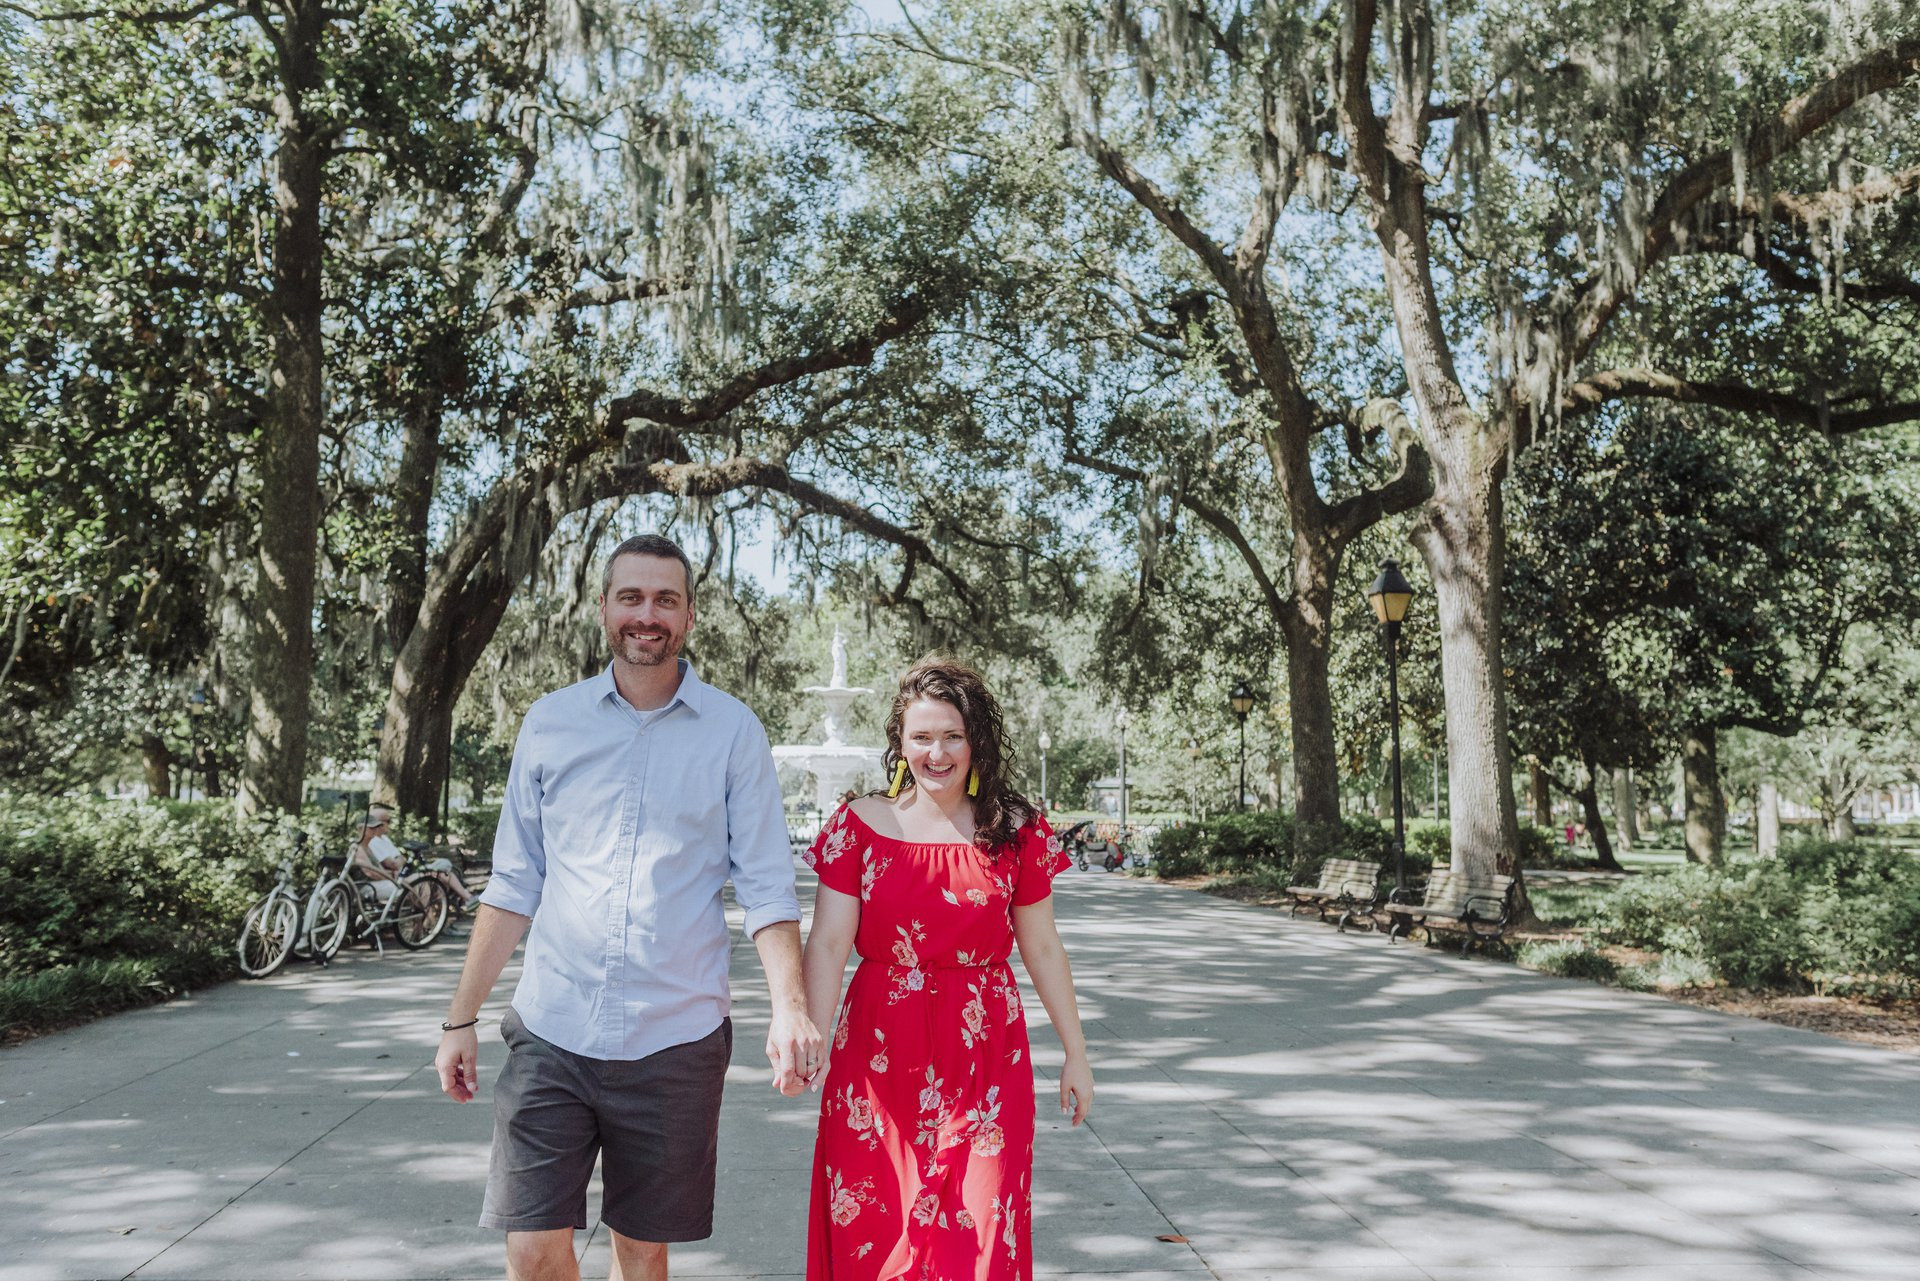 Savannah-United States-travel-story-Flytographer-39